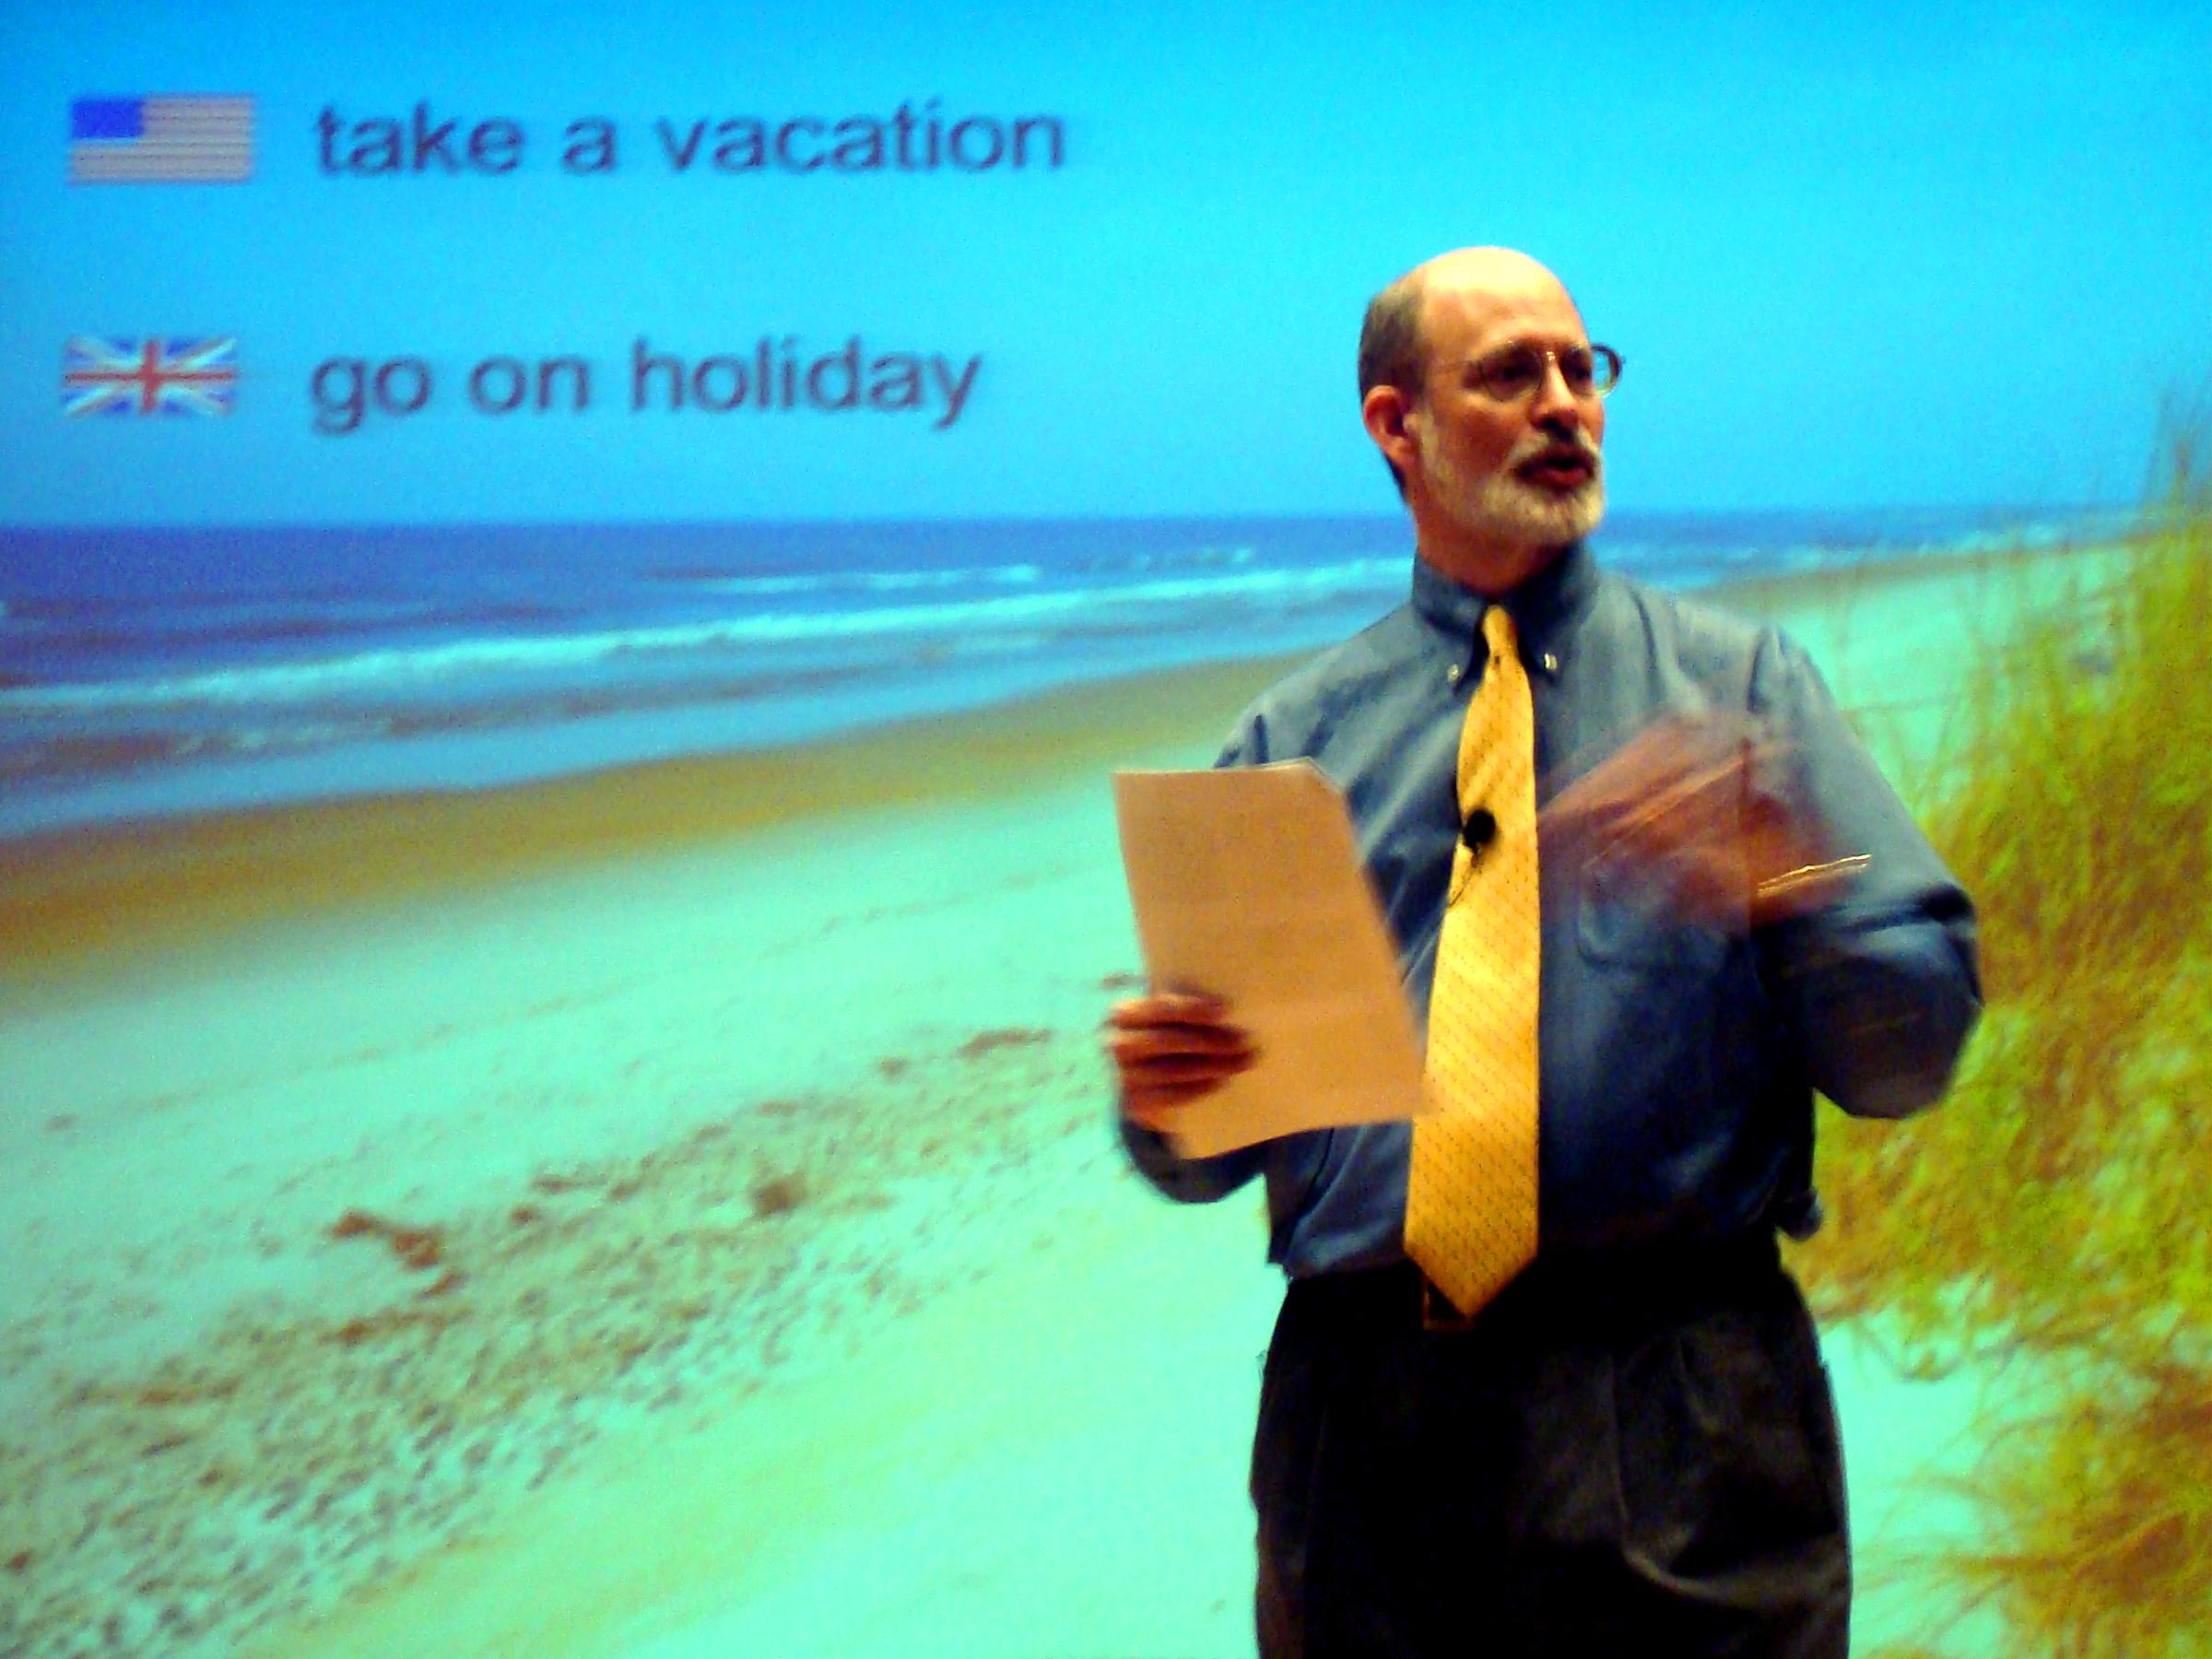 Joe McVeigh delivers a Pecha Kucha presentation at TESOL Arabia